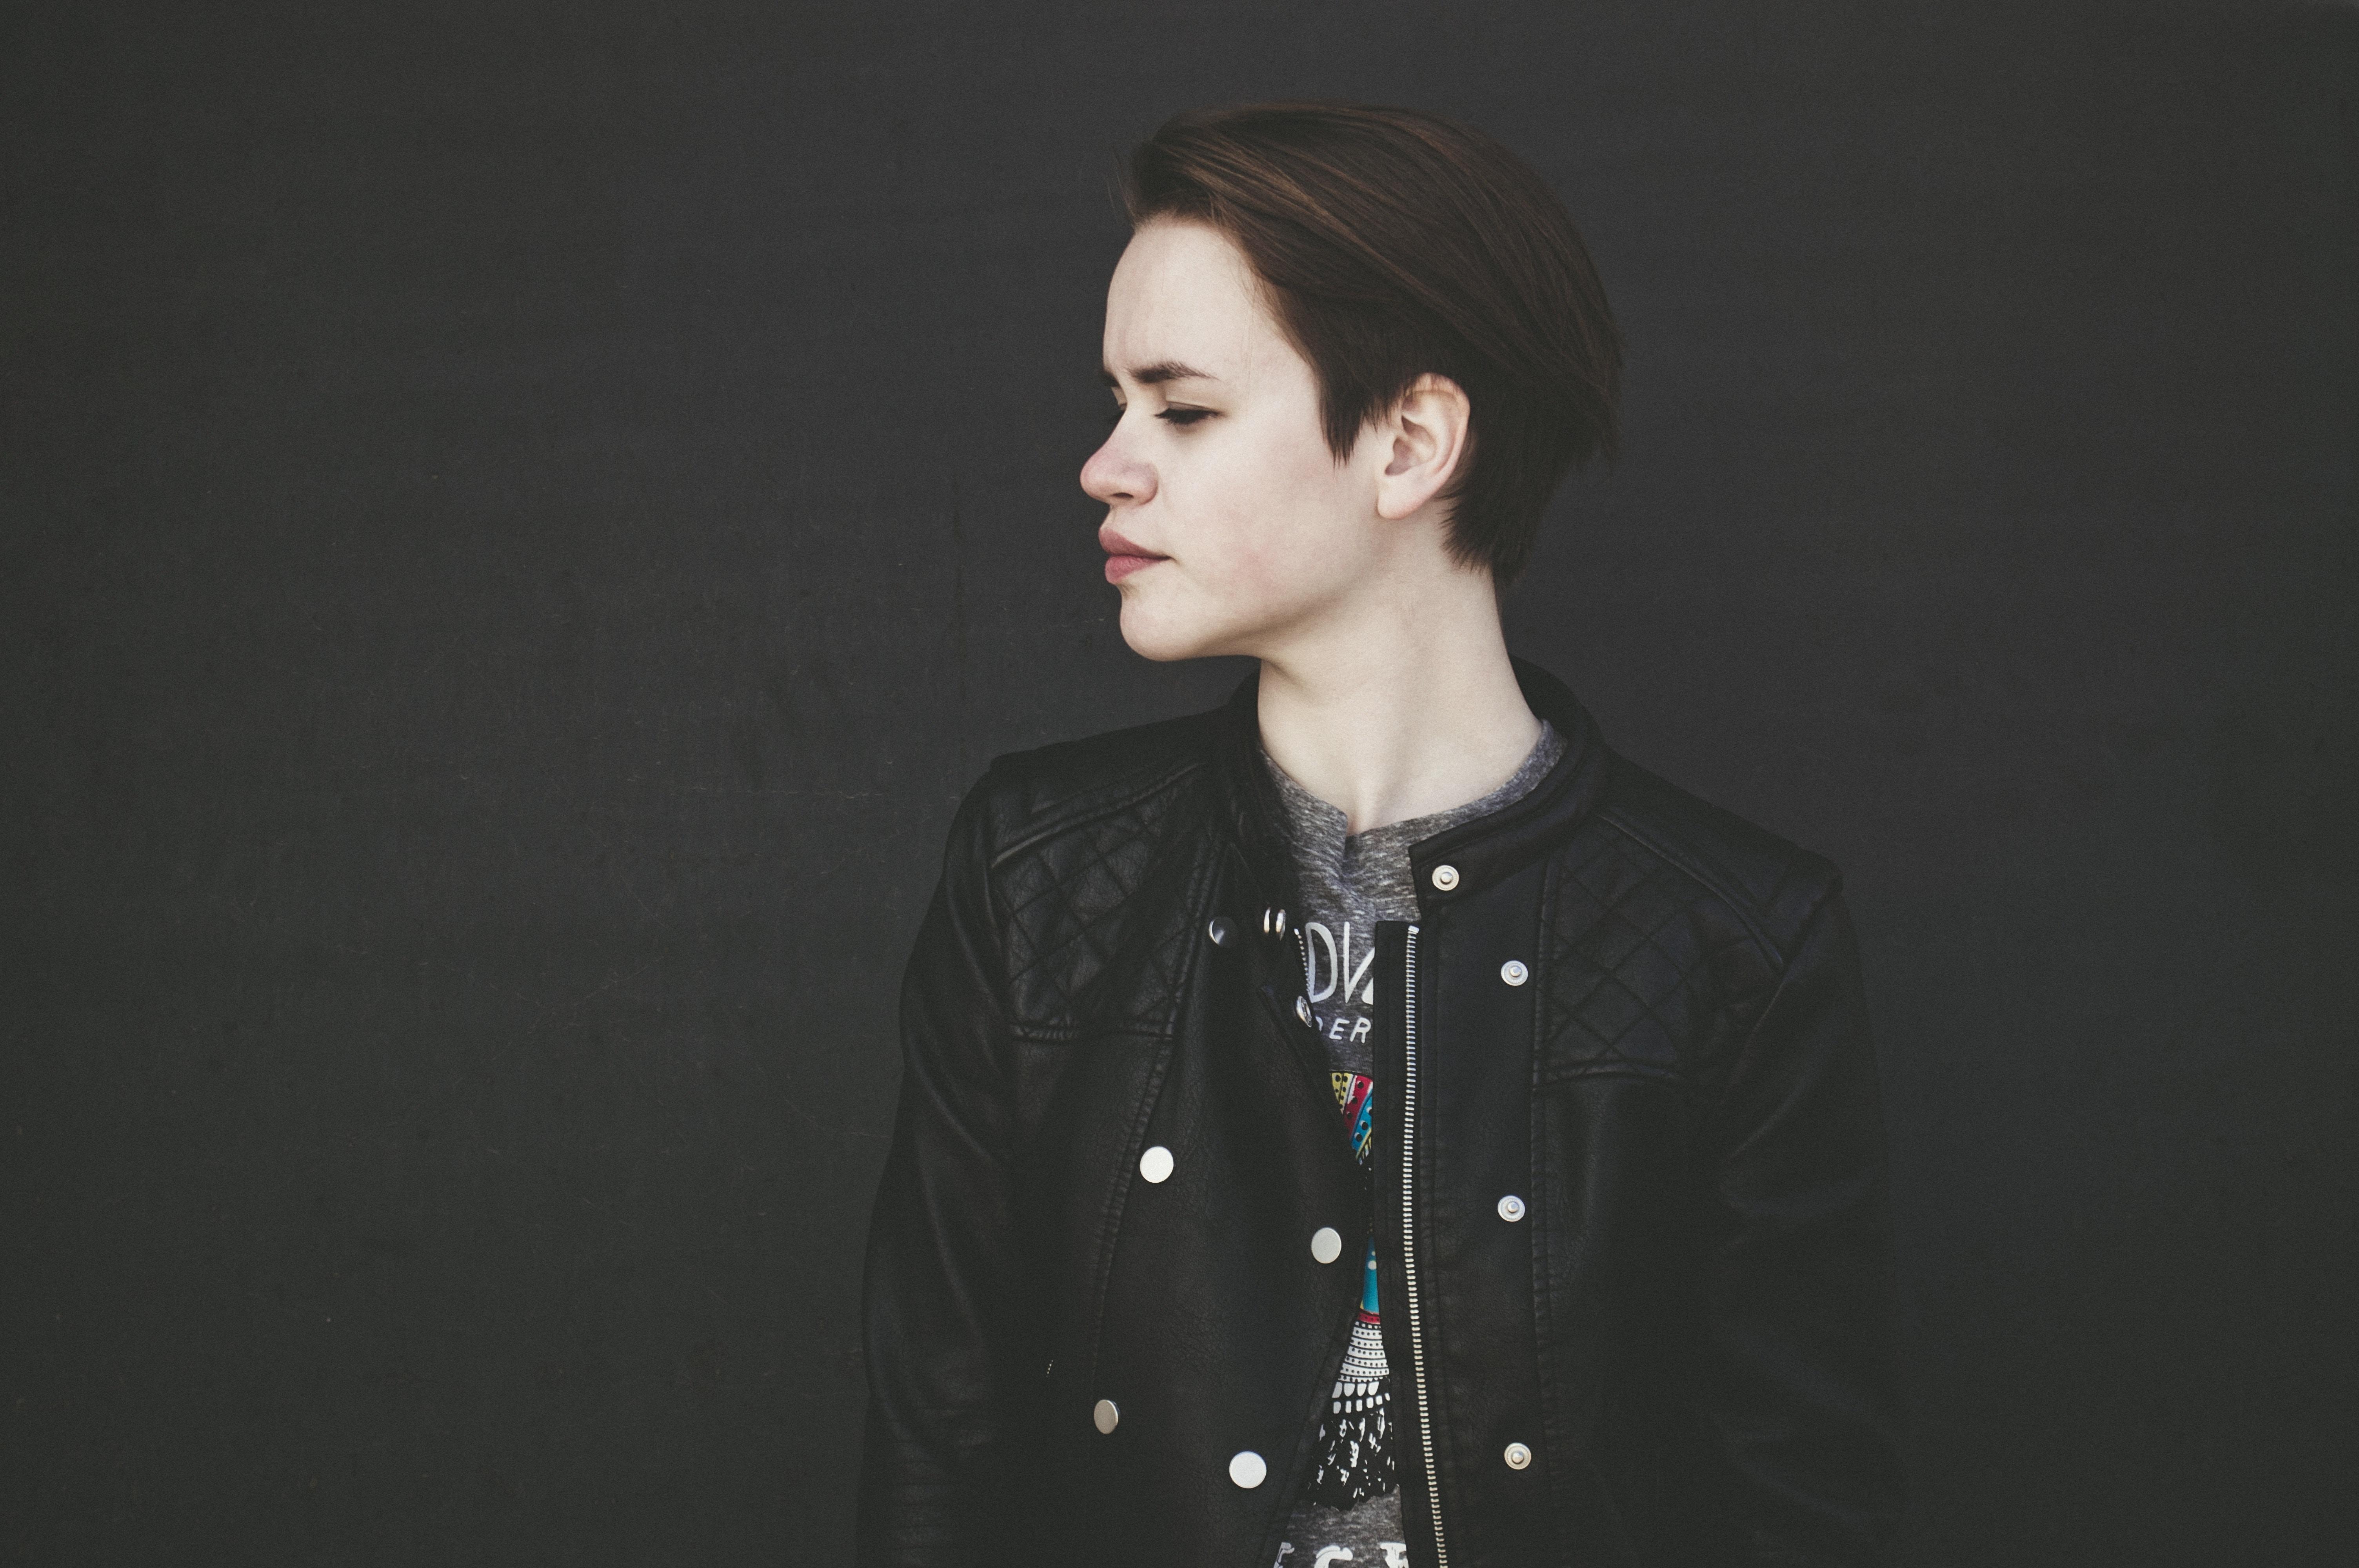 woman wearing black button-up jacket